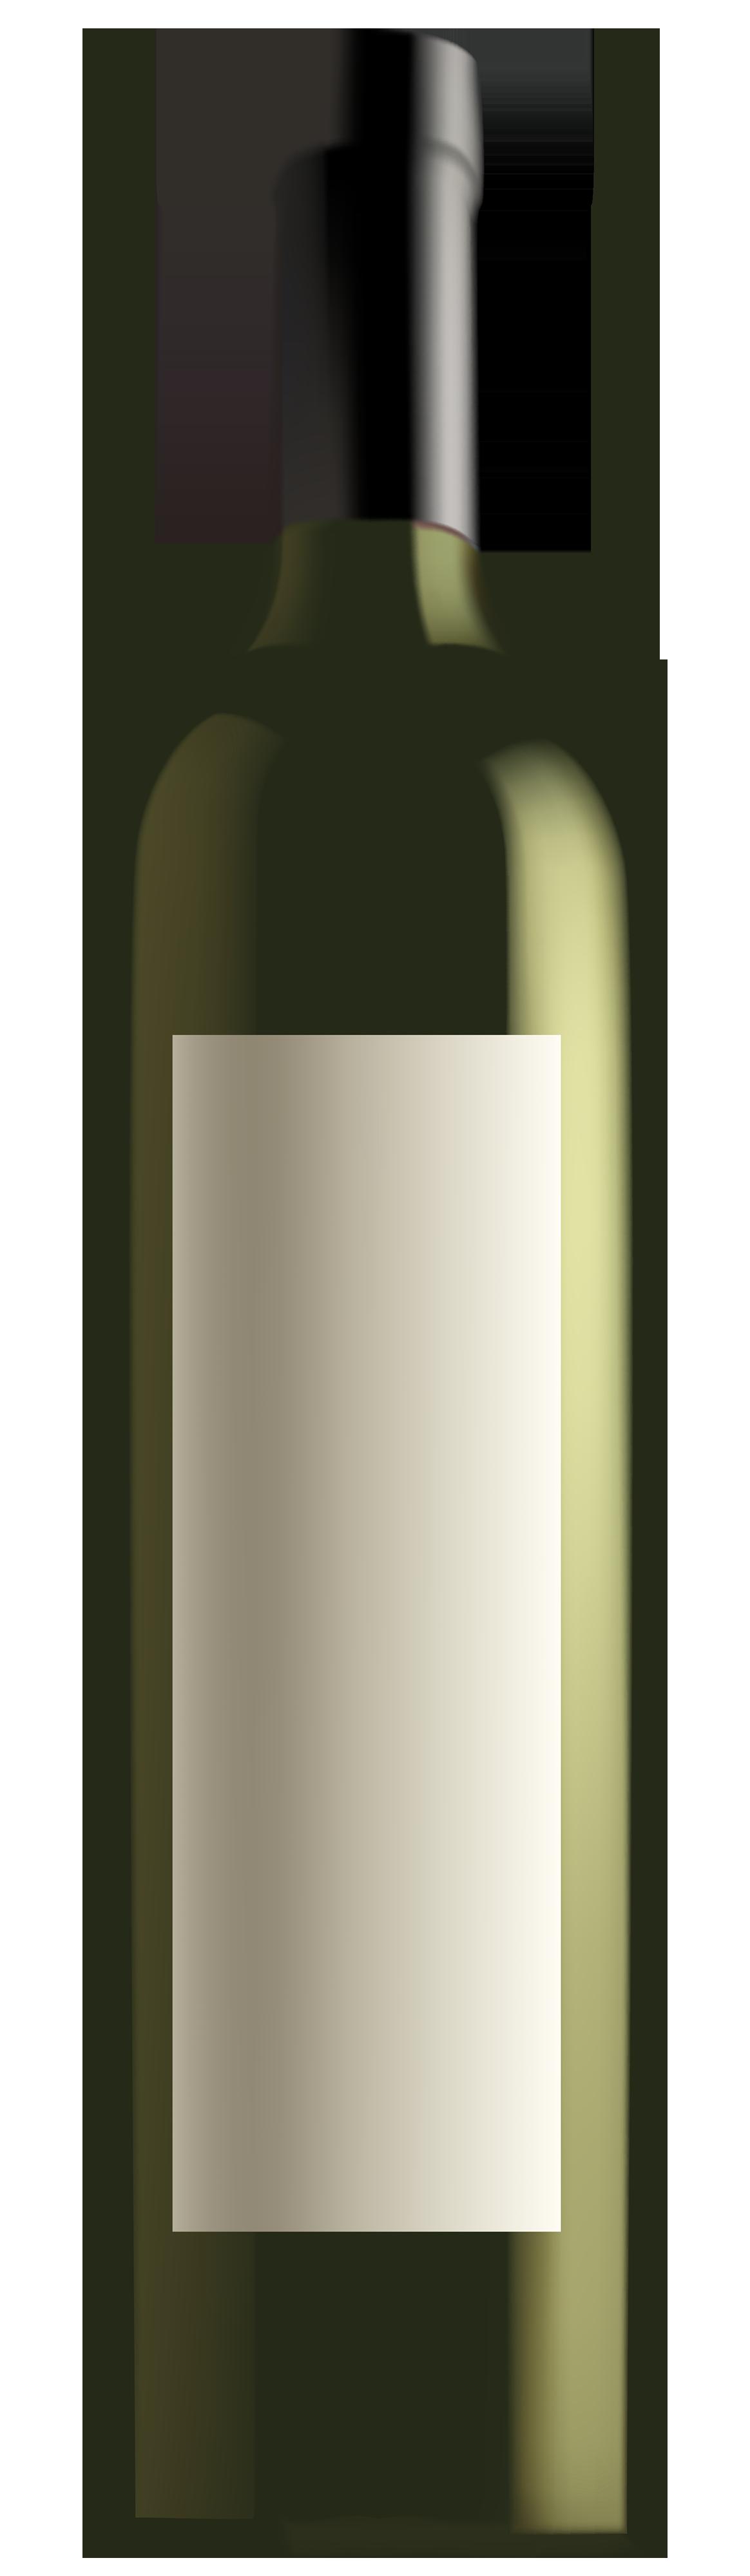 Wine jug clipart clip art library stock Wine Clipart wine jug 24 - 1164 X 4000 Free Clip Art stock ... clip art library stock